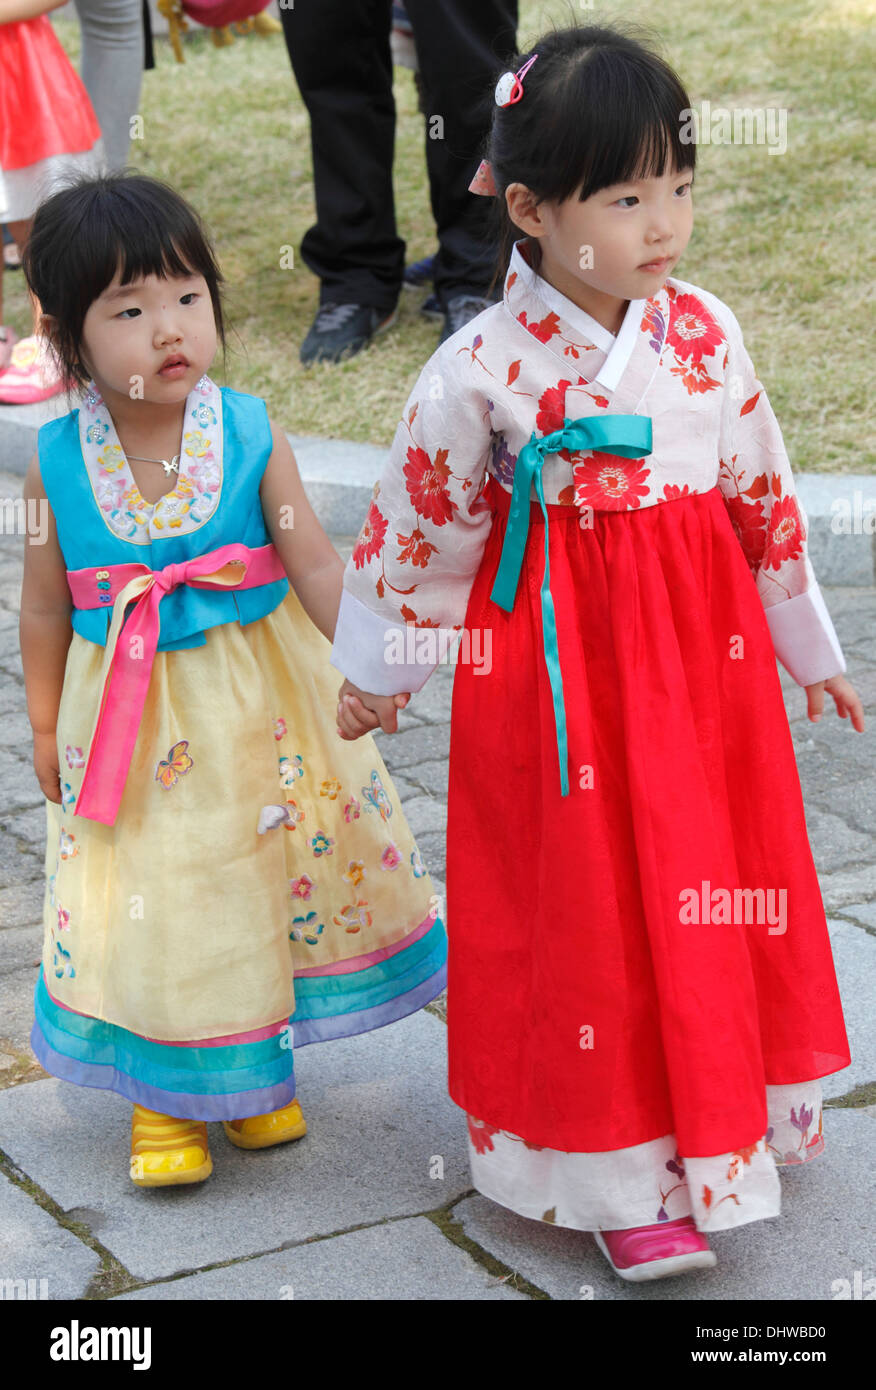 South Korea Seoul Girls In Traditional Dress Stock Photo 62638044